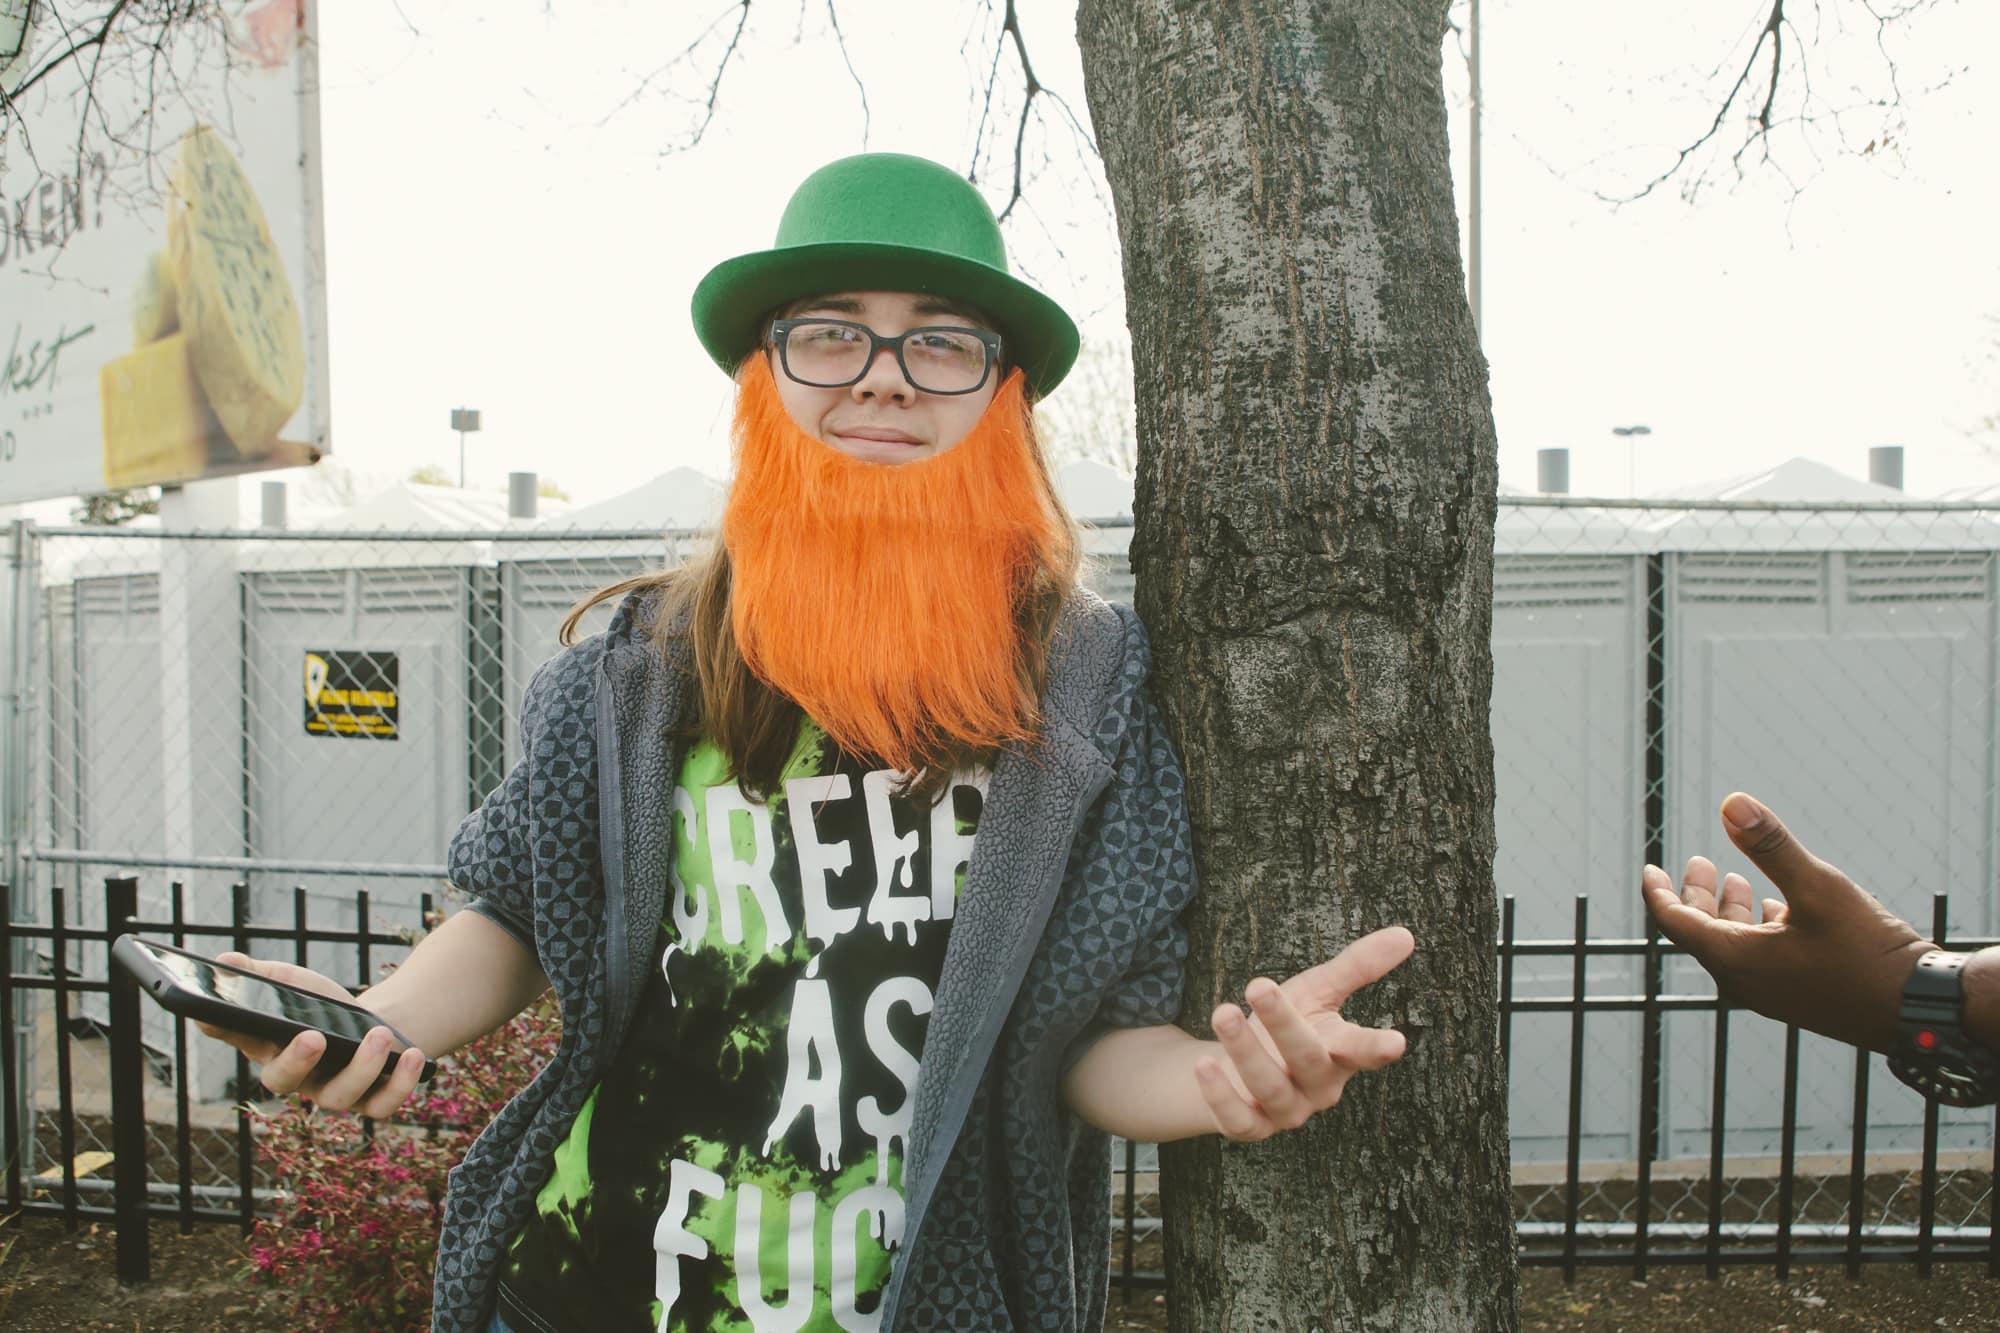 Such an epic orange beard